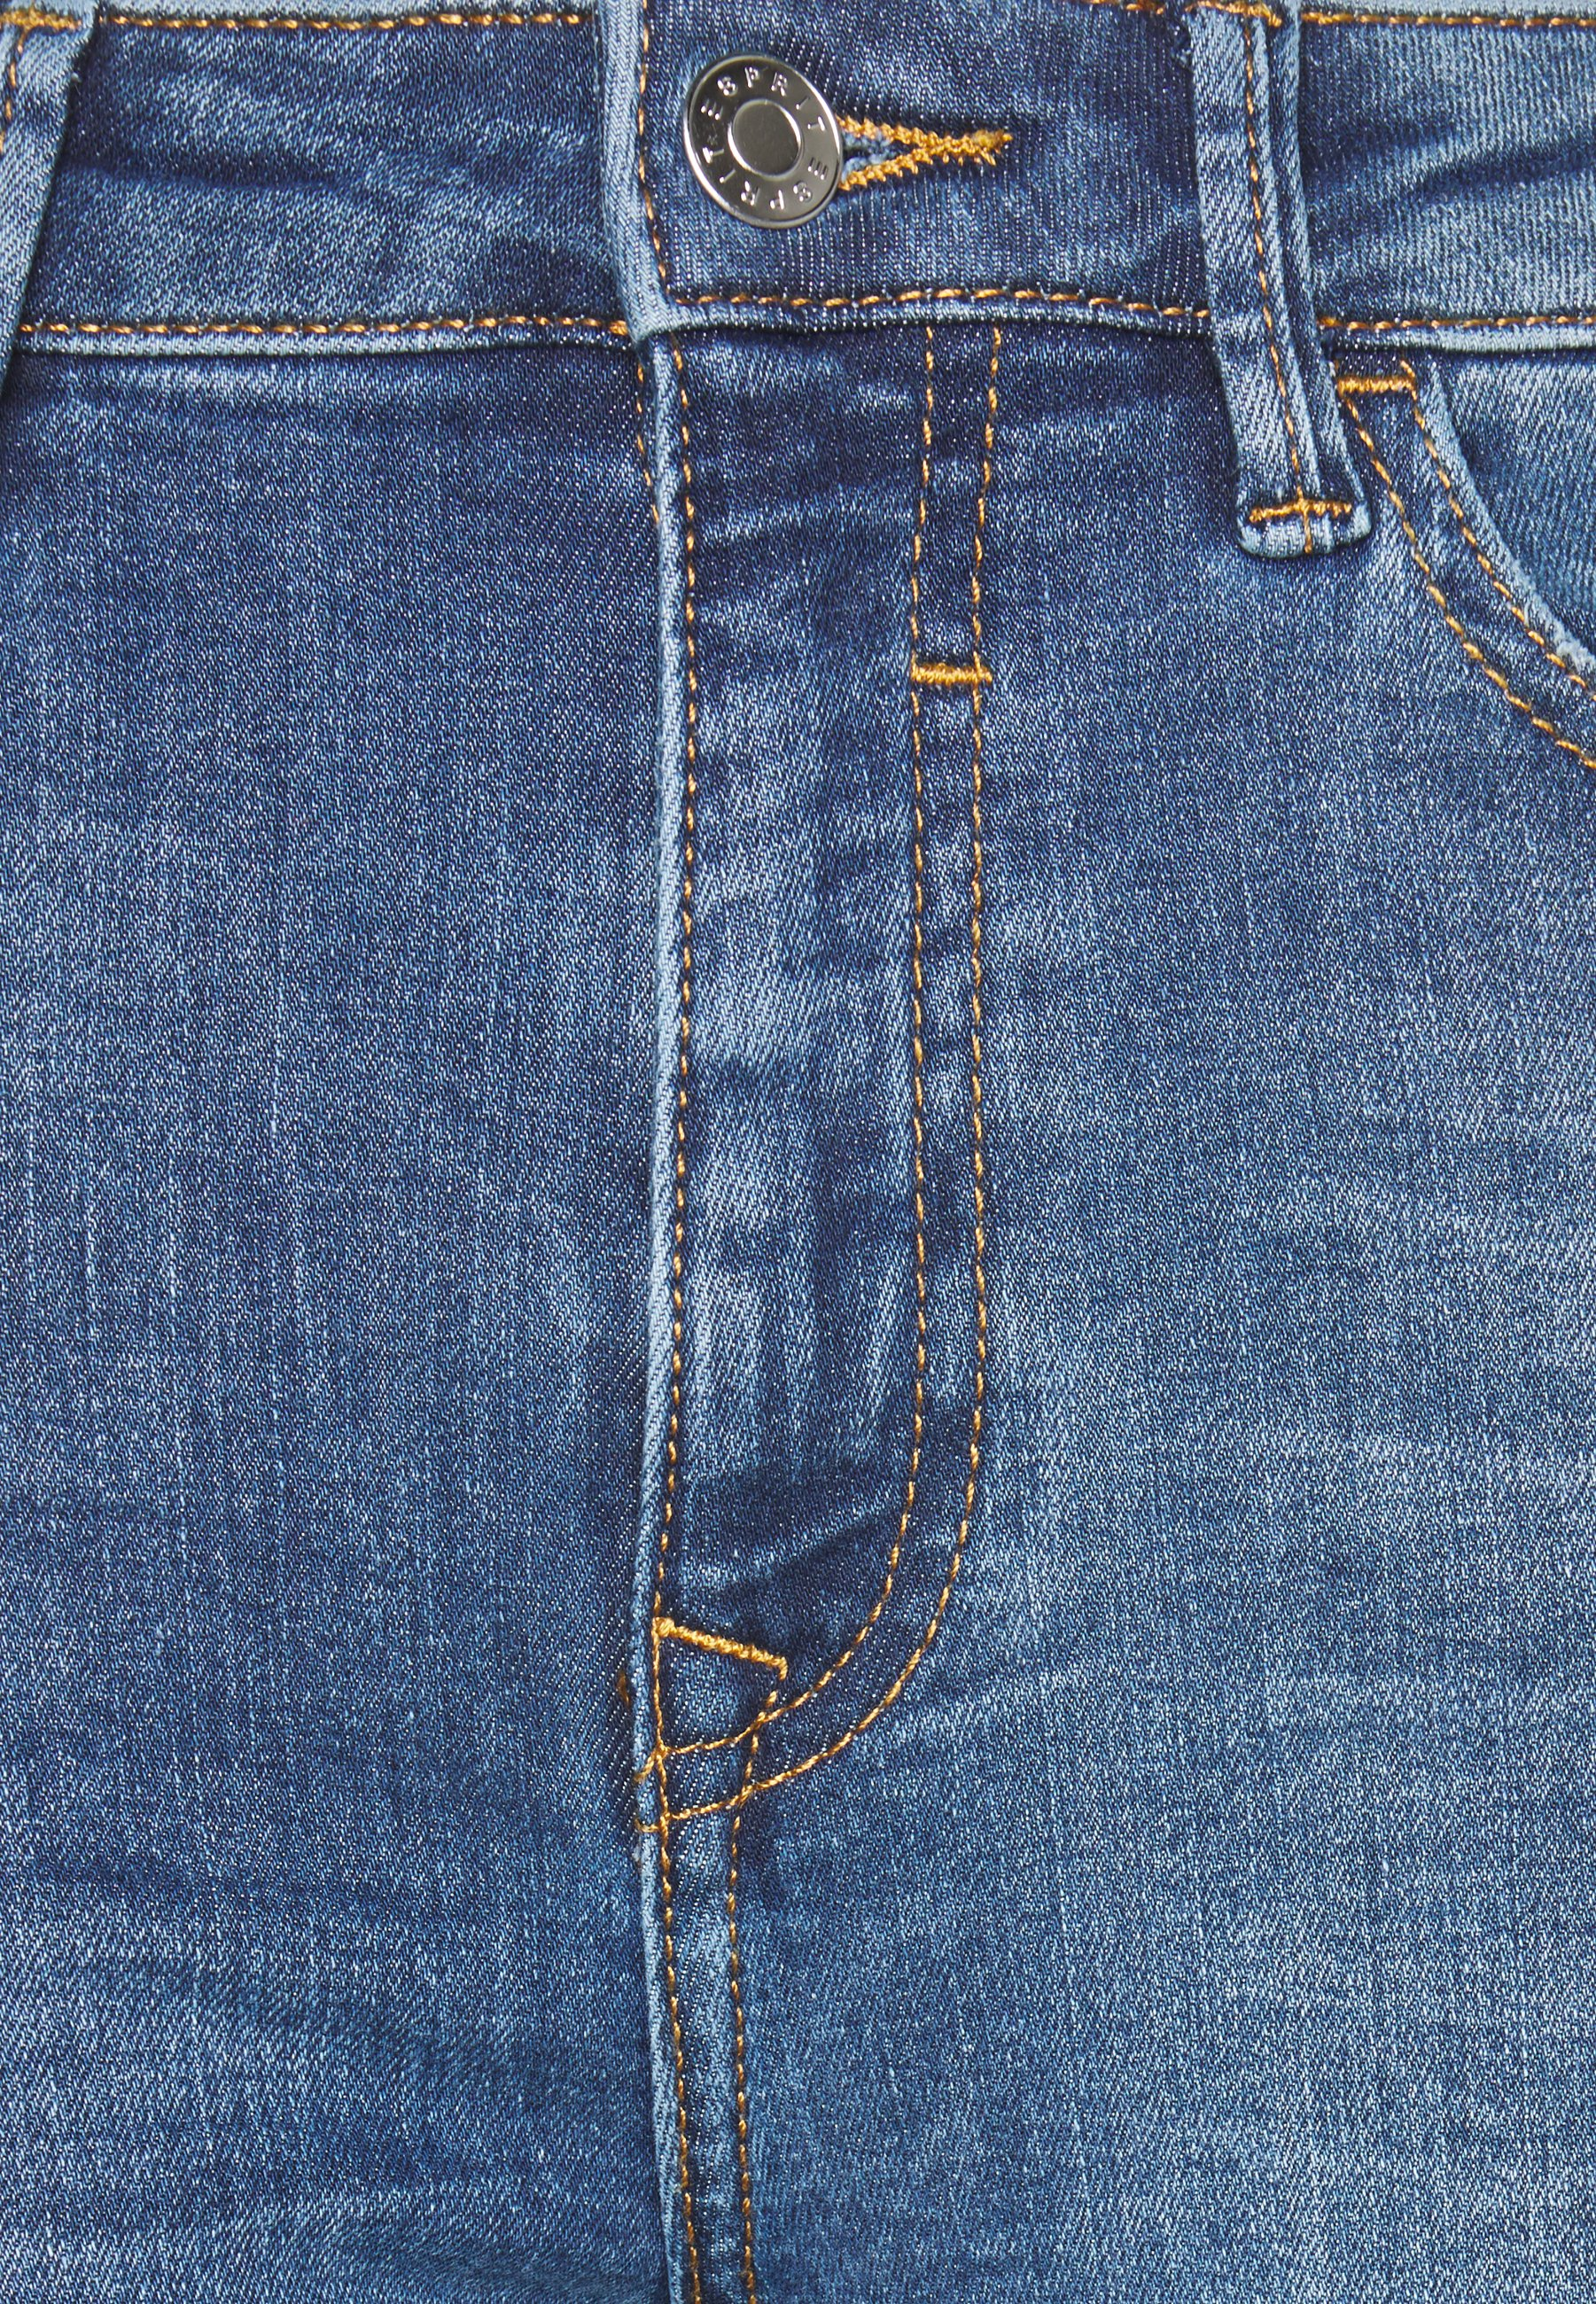 Esprit Slim fit jeans - blue medium wash - Women's Clothing 4xJbA